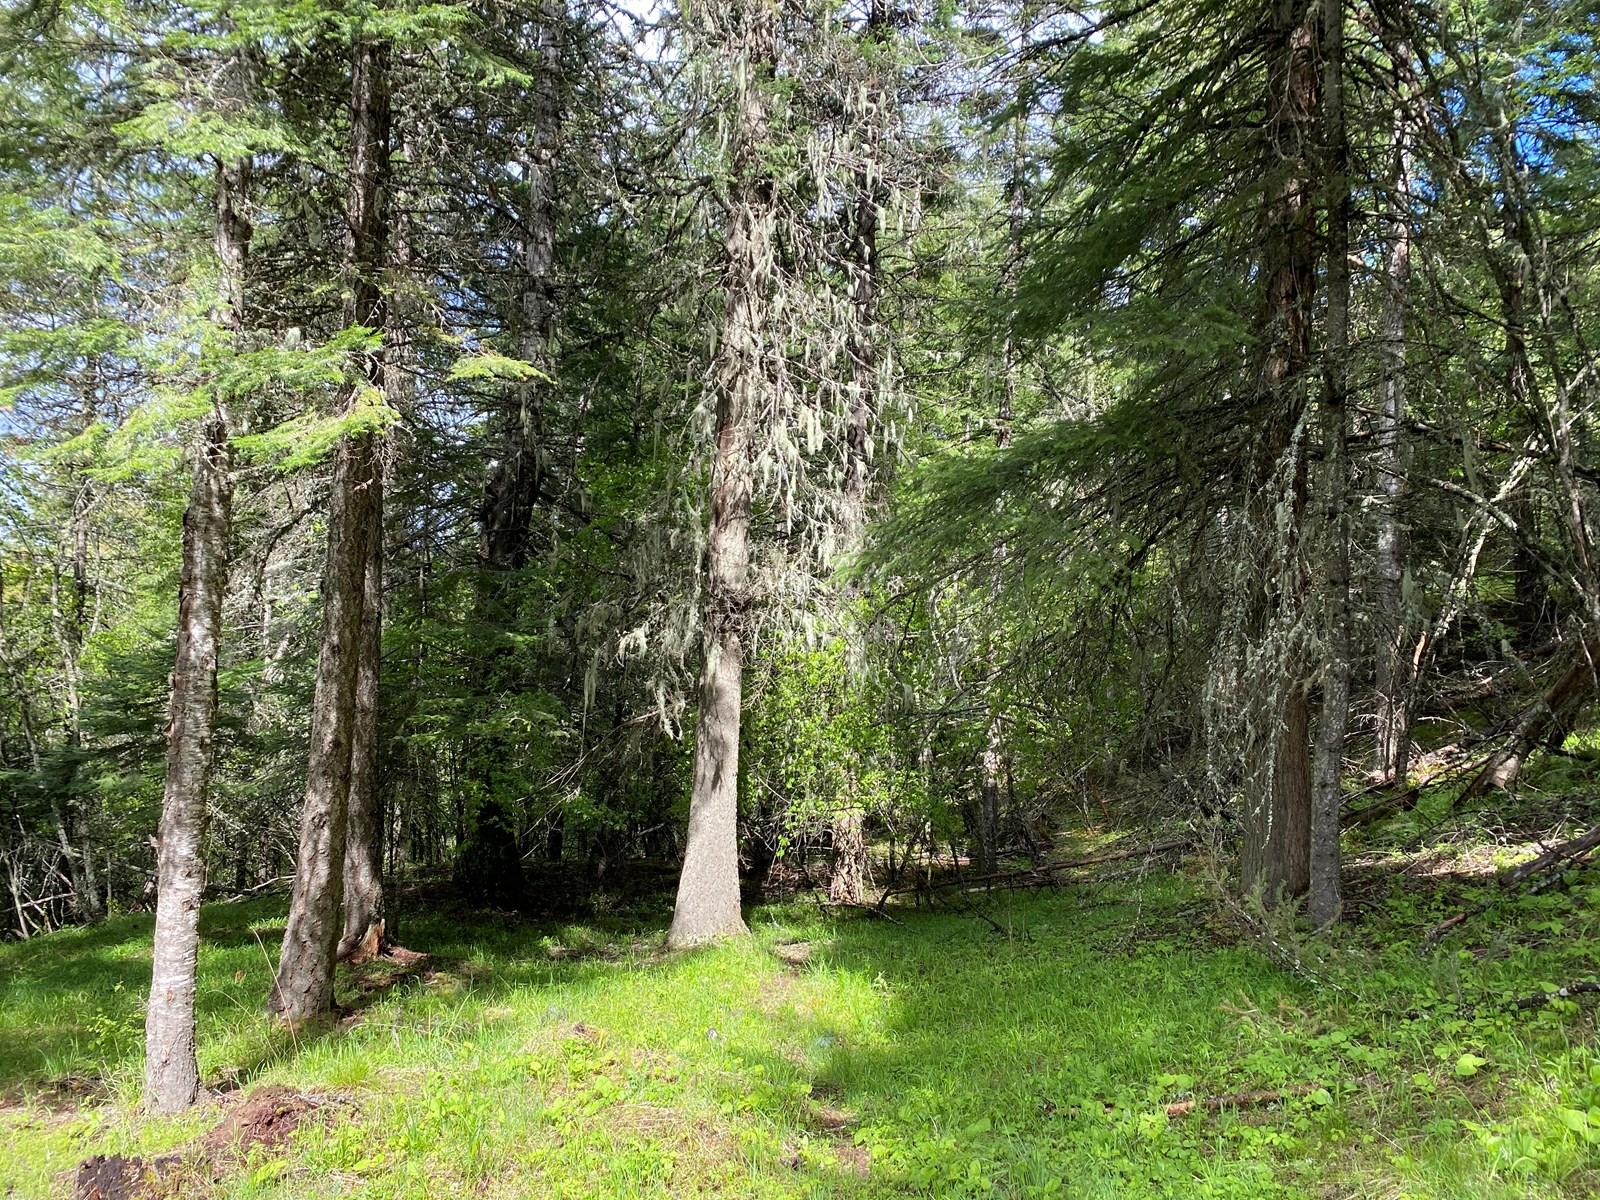 Orofino, ID Recreational Land for Sale, Timberland, Campsite